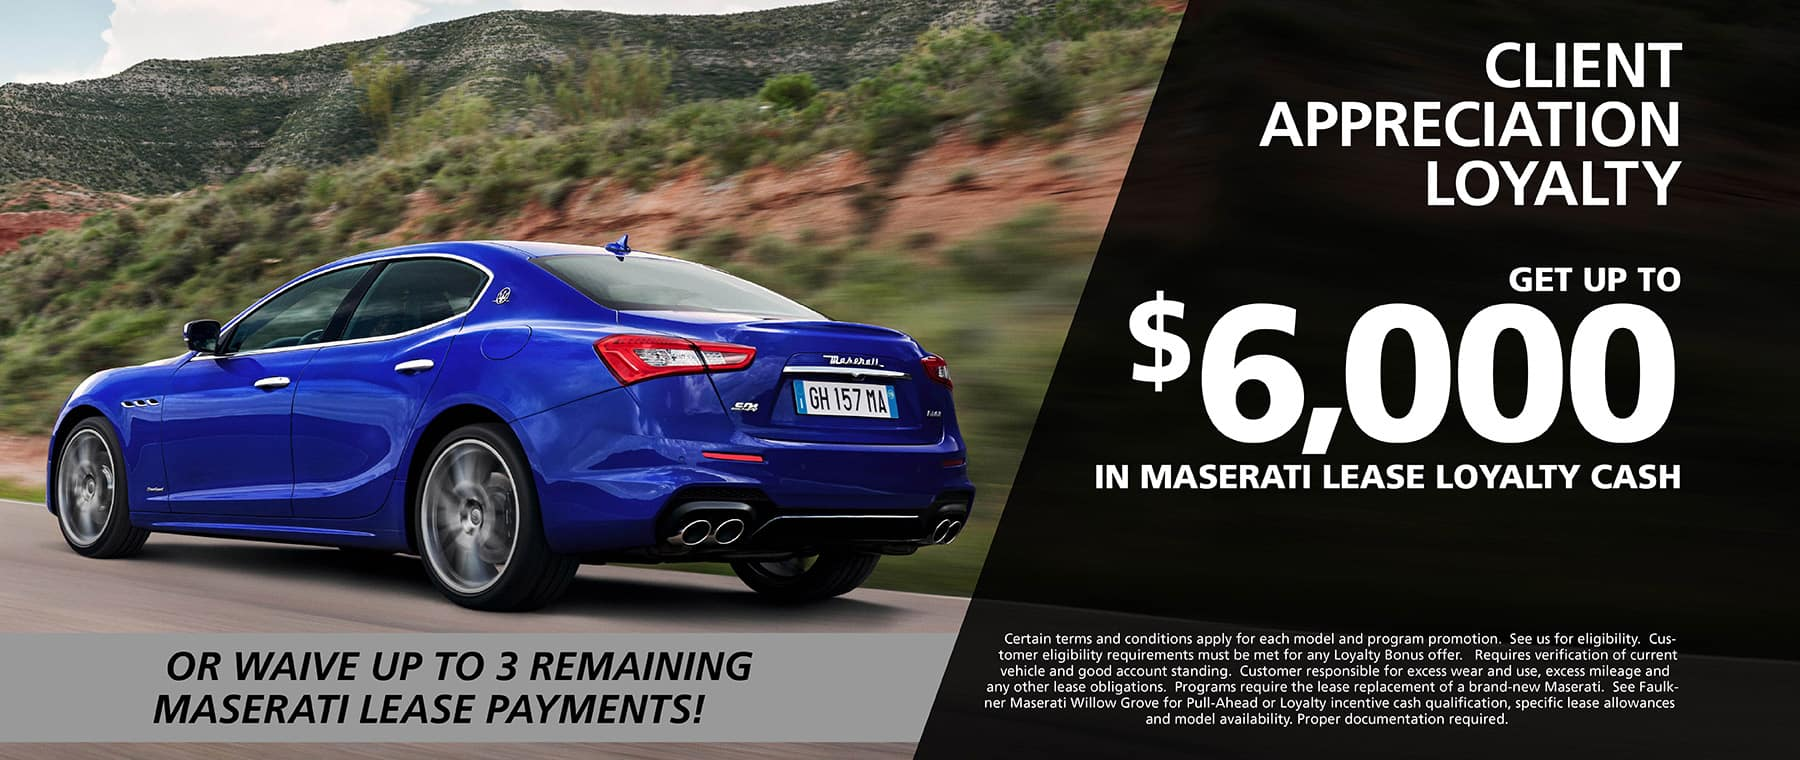 Shop Maserati Client Appreciation Loyalty